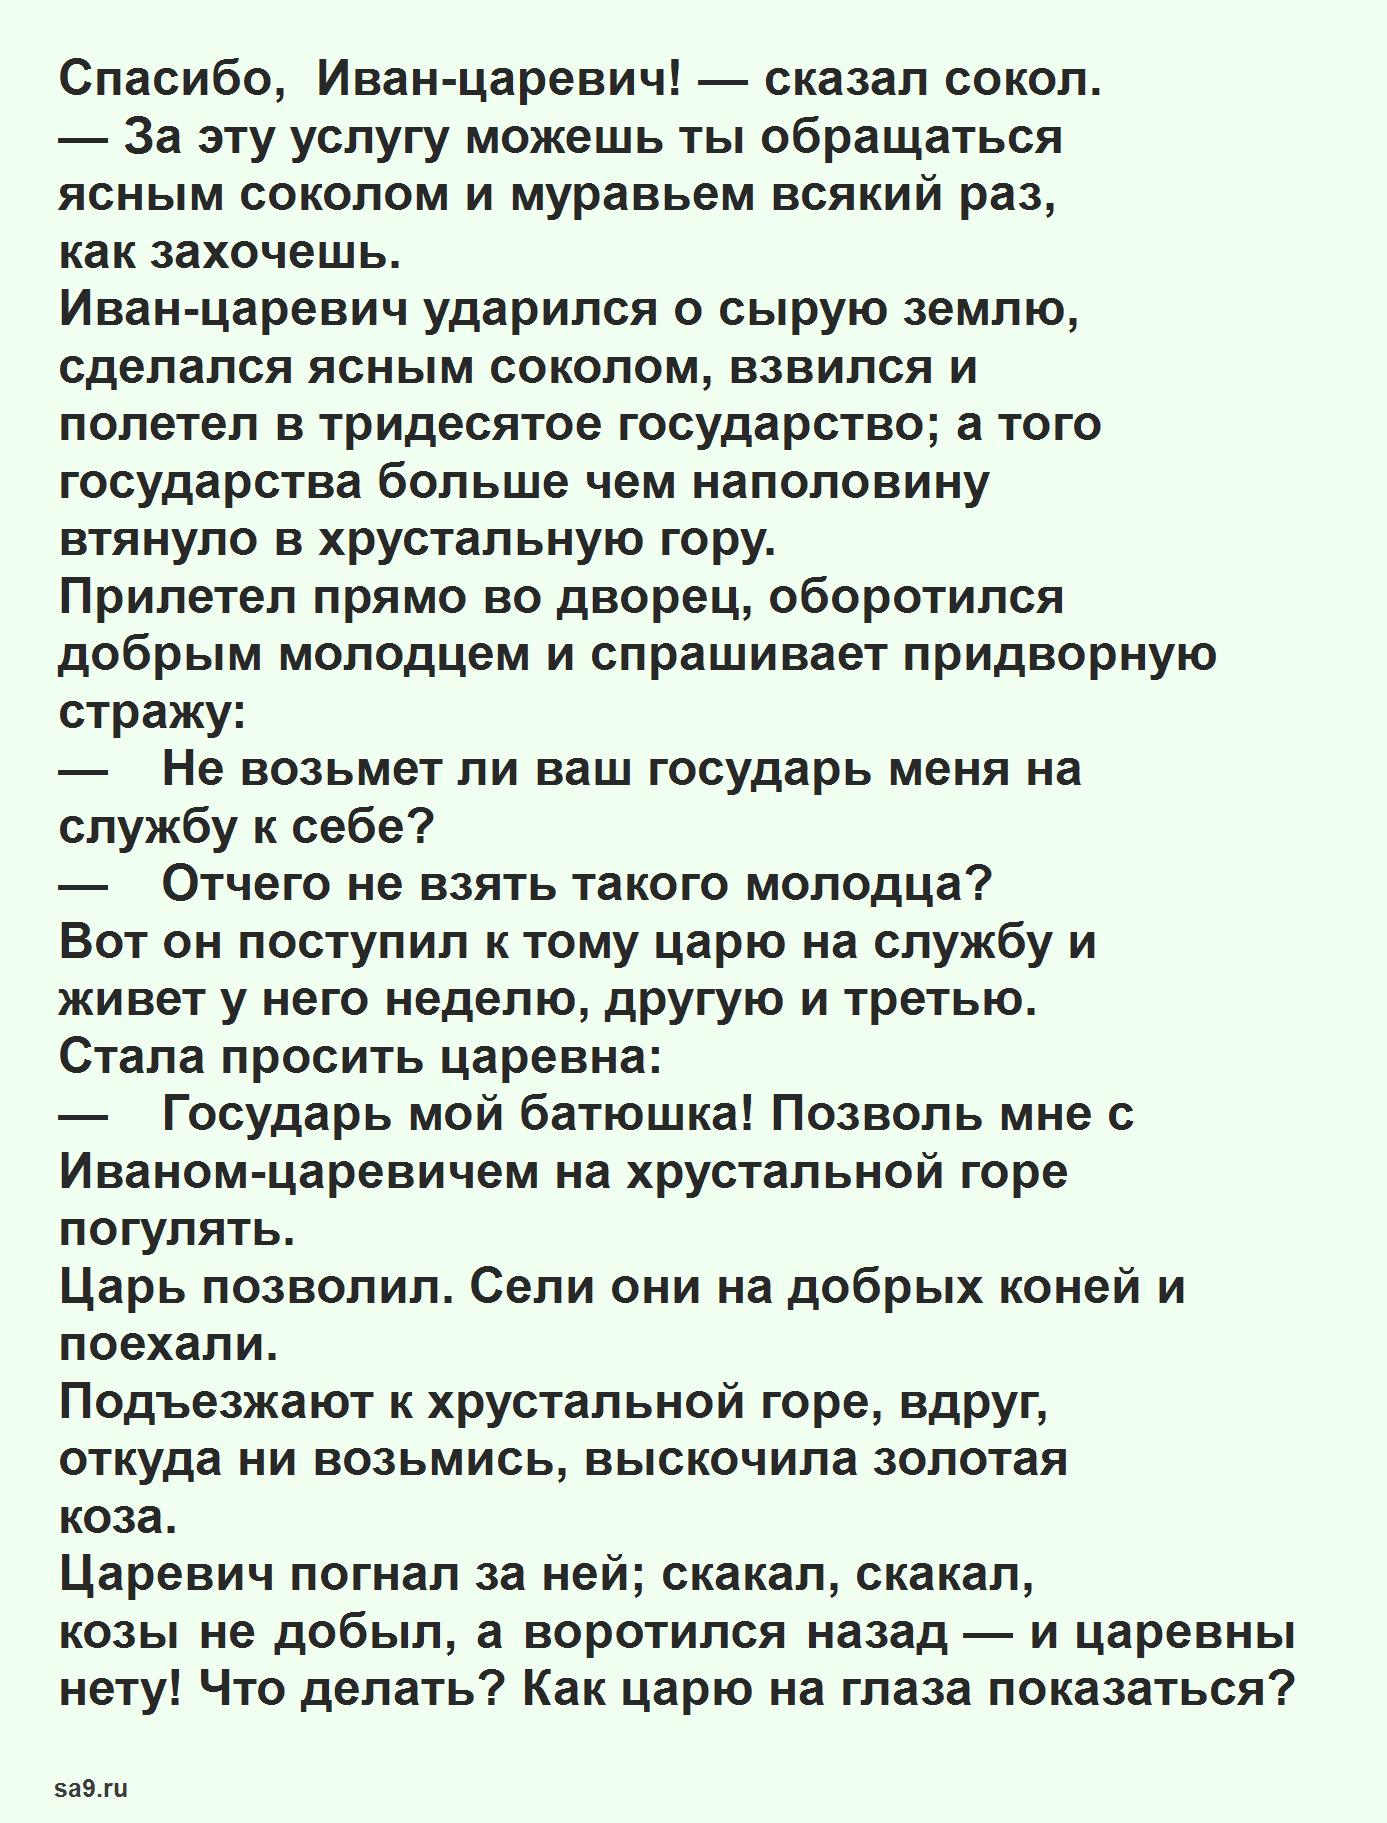 Русская народная сказка для детей – Хрустальная гора